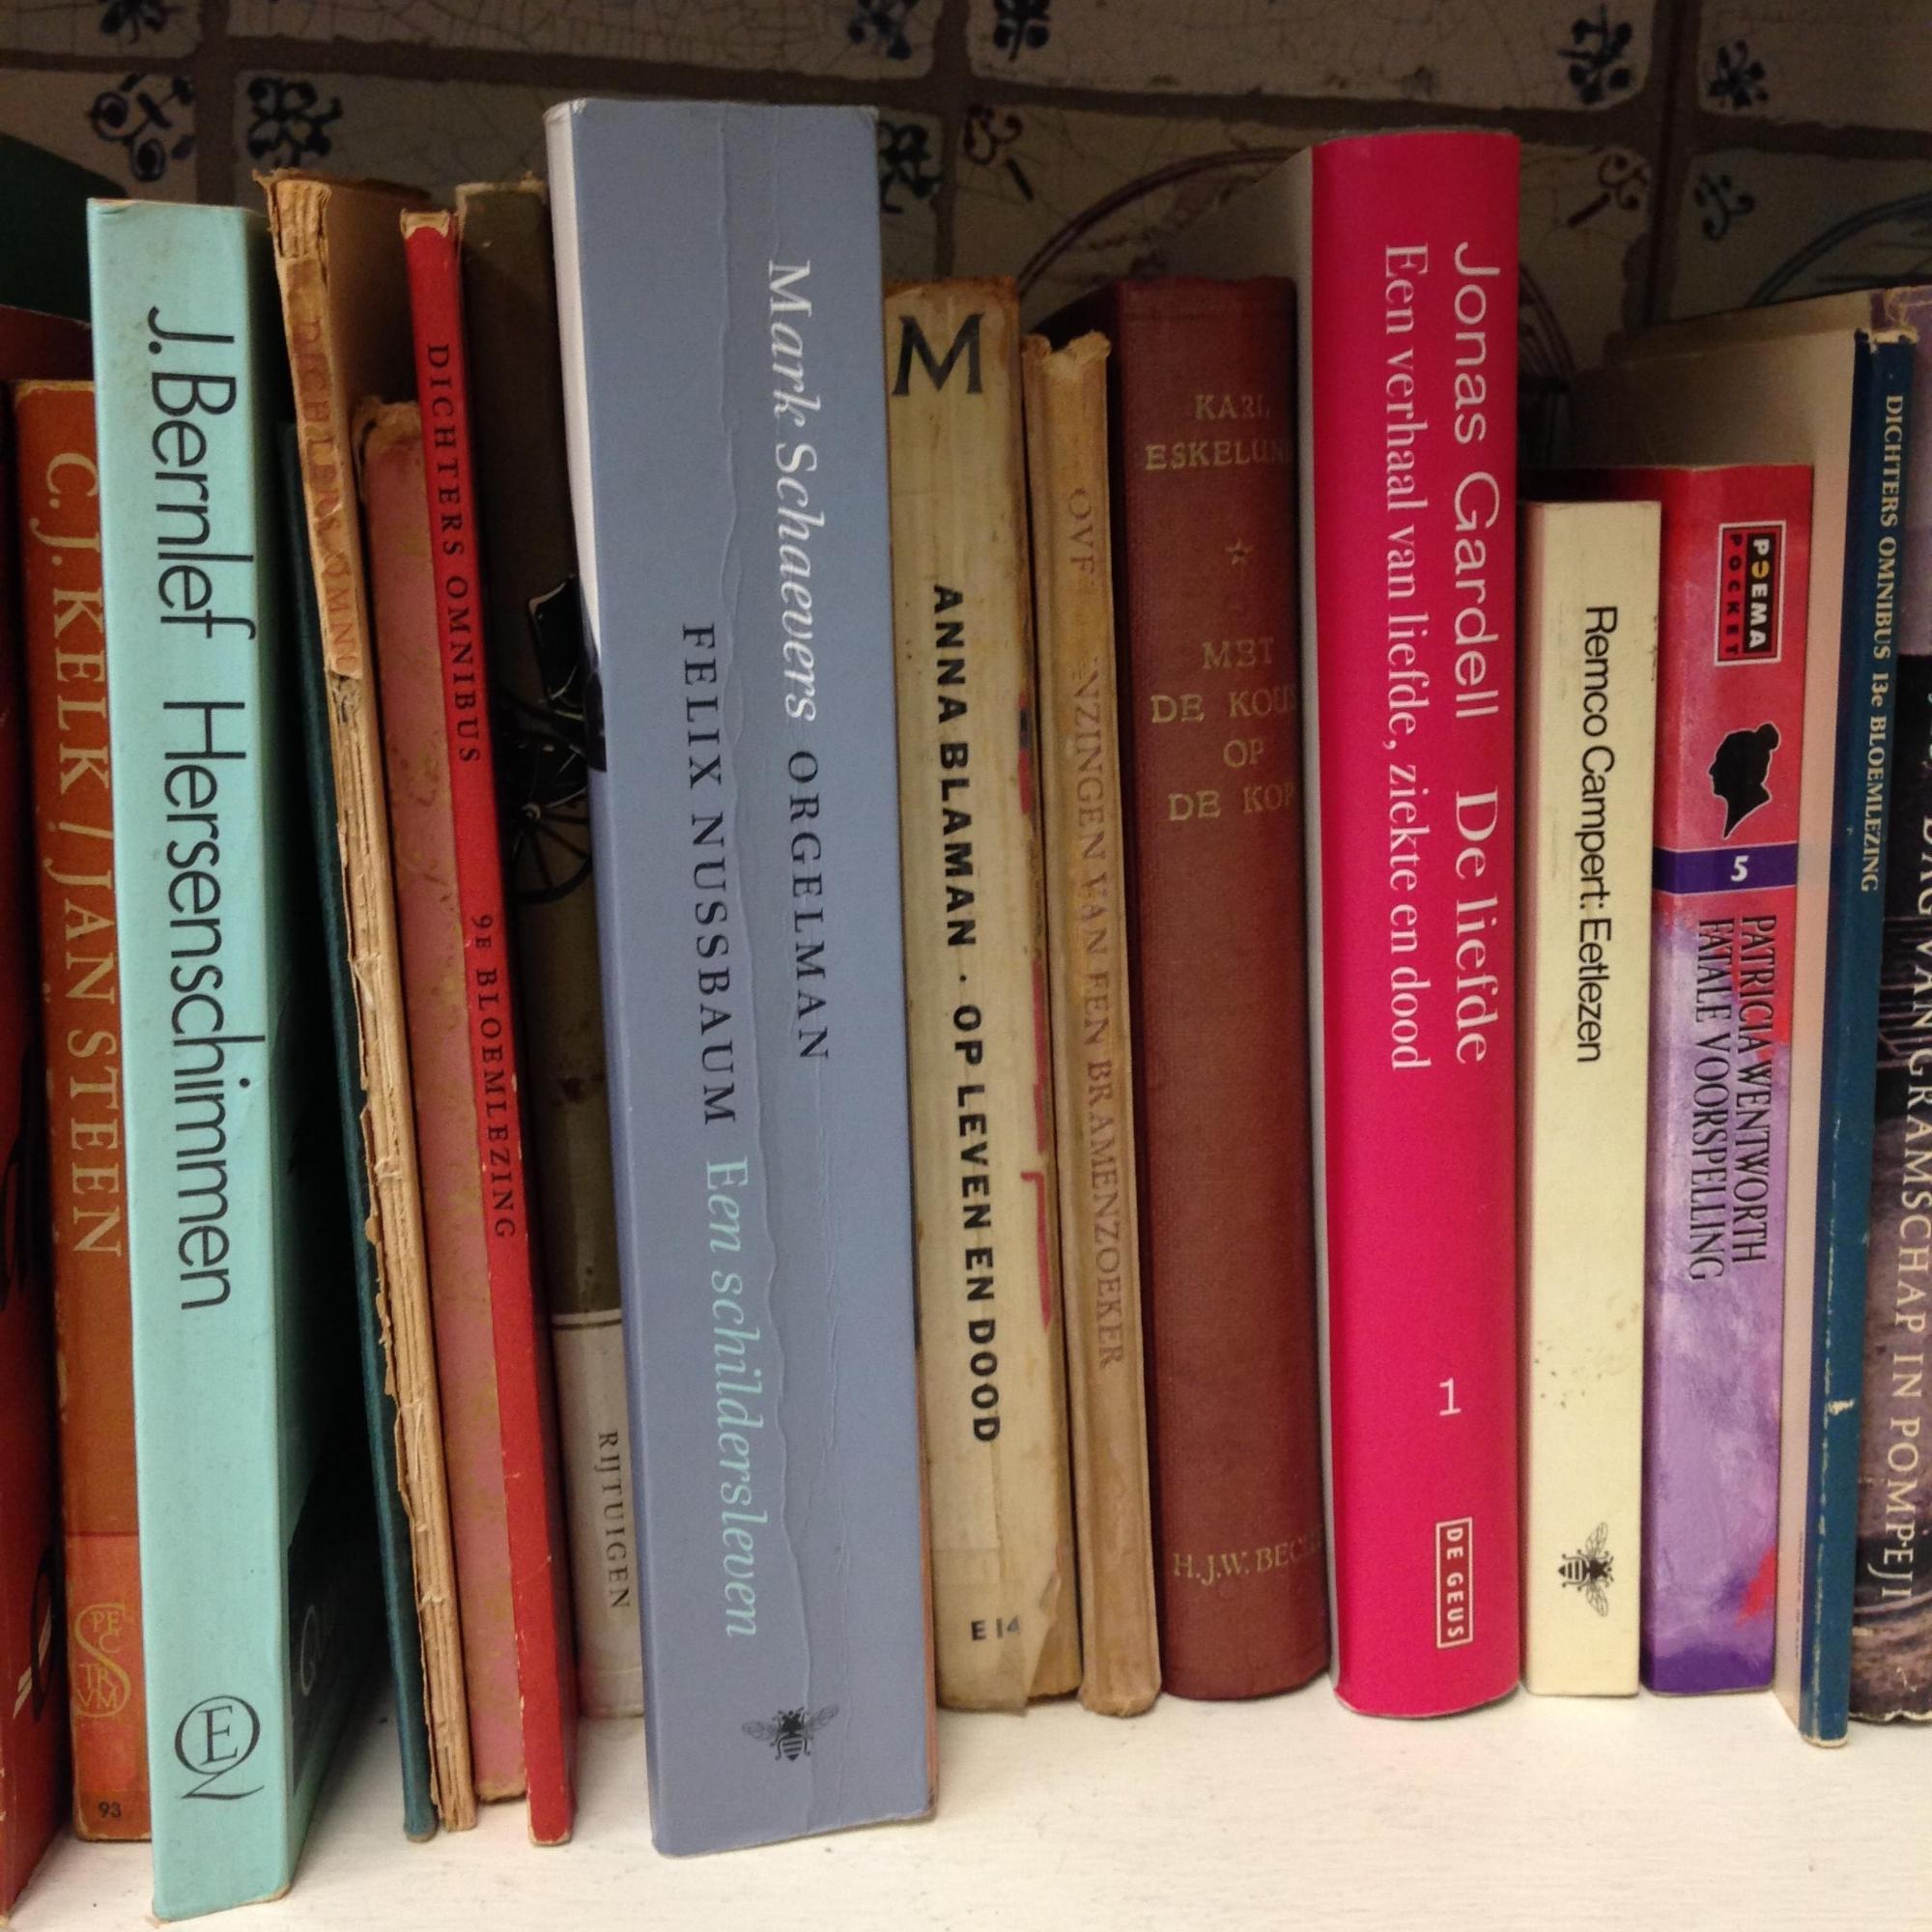 Enjoy our Little Dutch Free Library! Bring a book, take a book